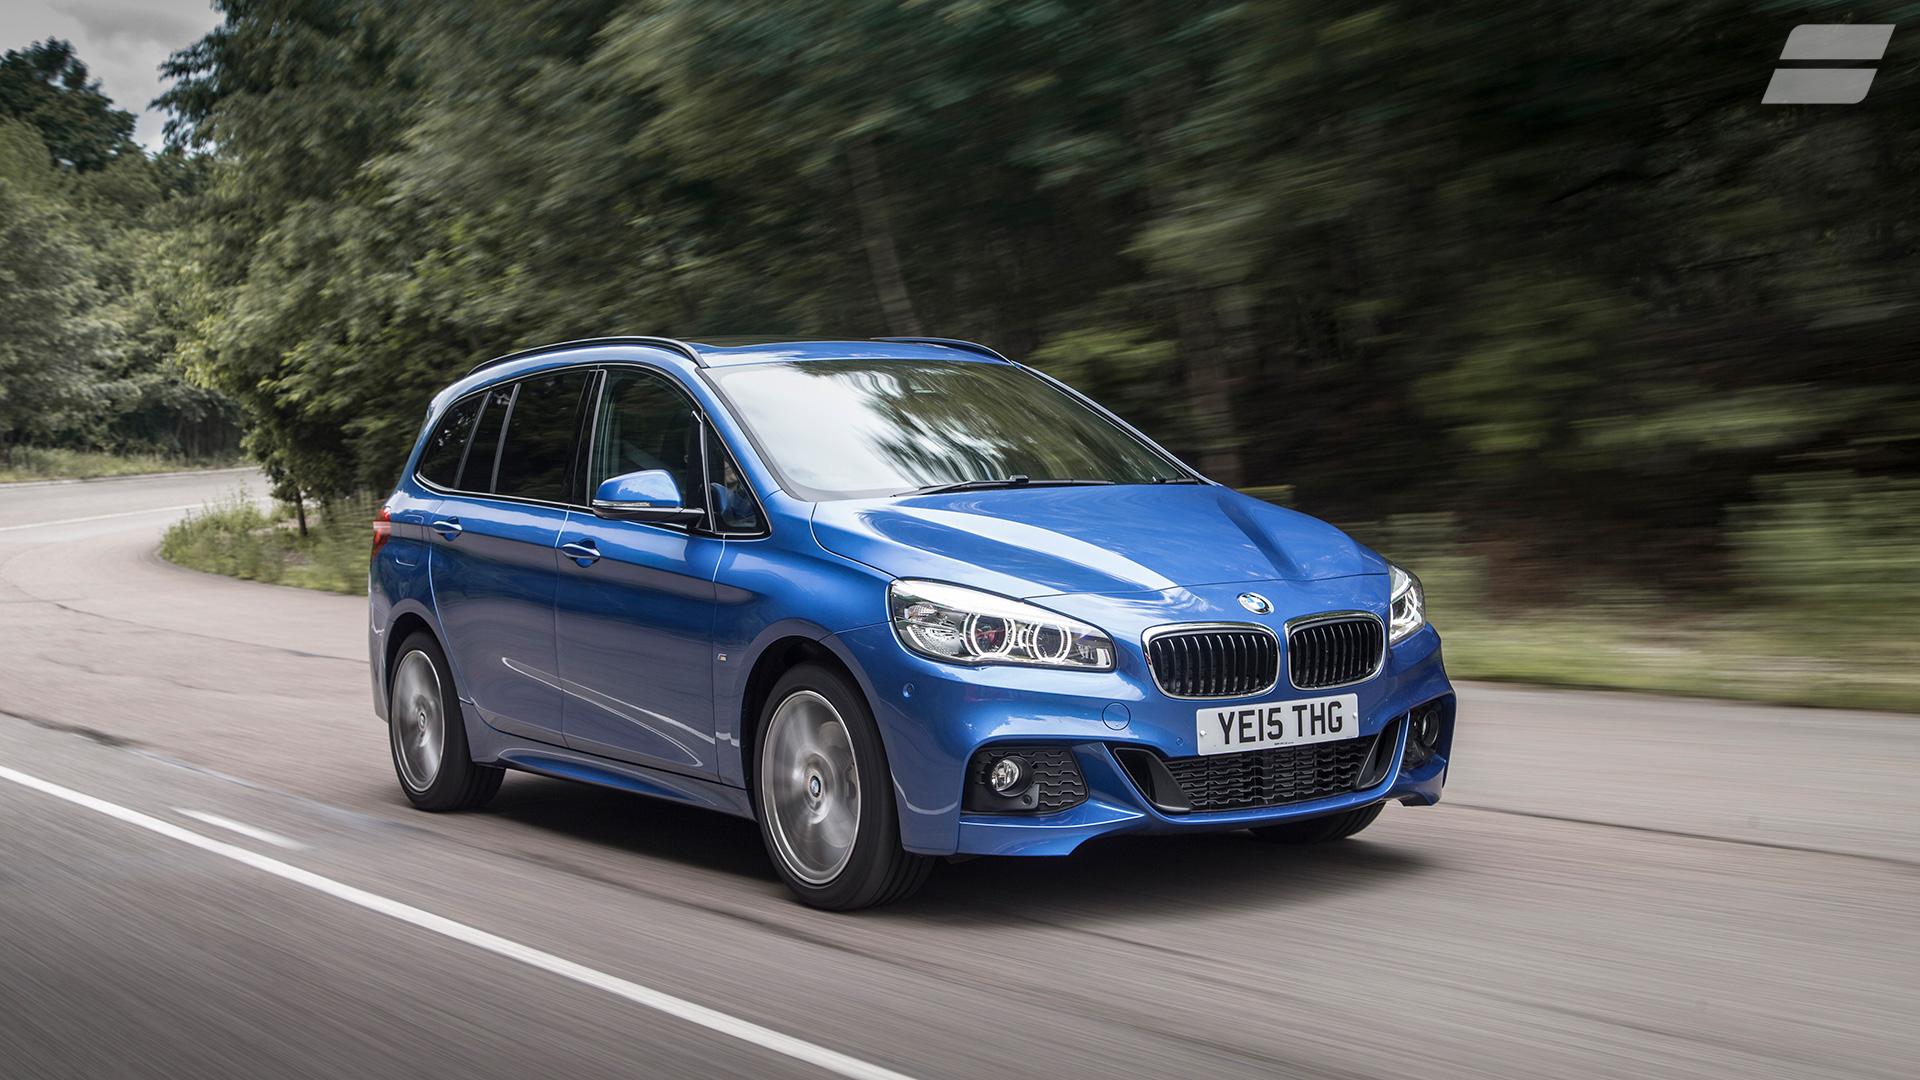 Safe Auto Insurance Reviews >> BMW 2 Series Gran Tourer MPV (2015 - ) review | Auto Trader UK